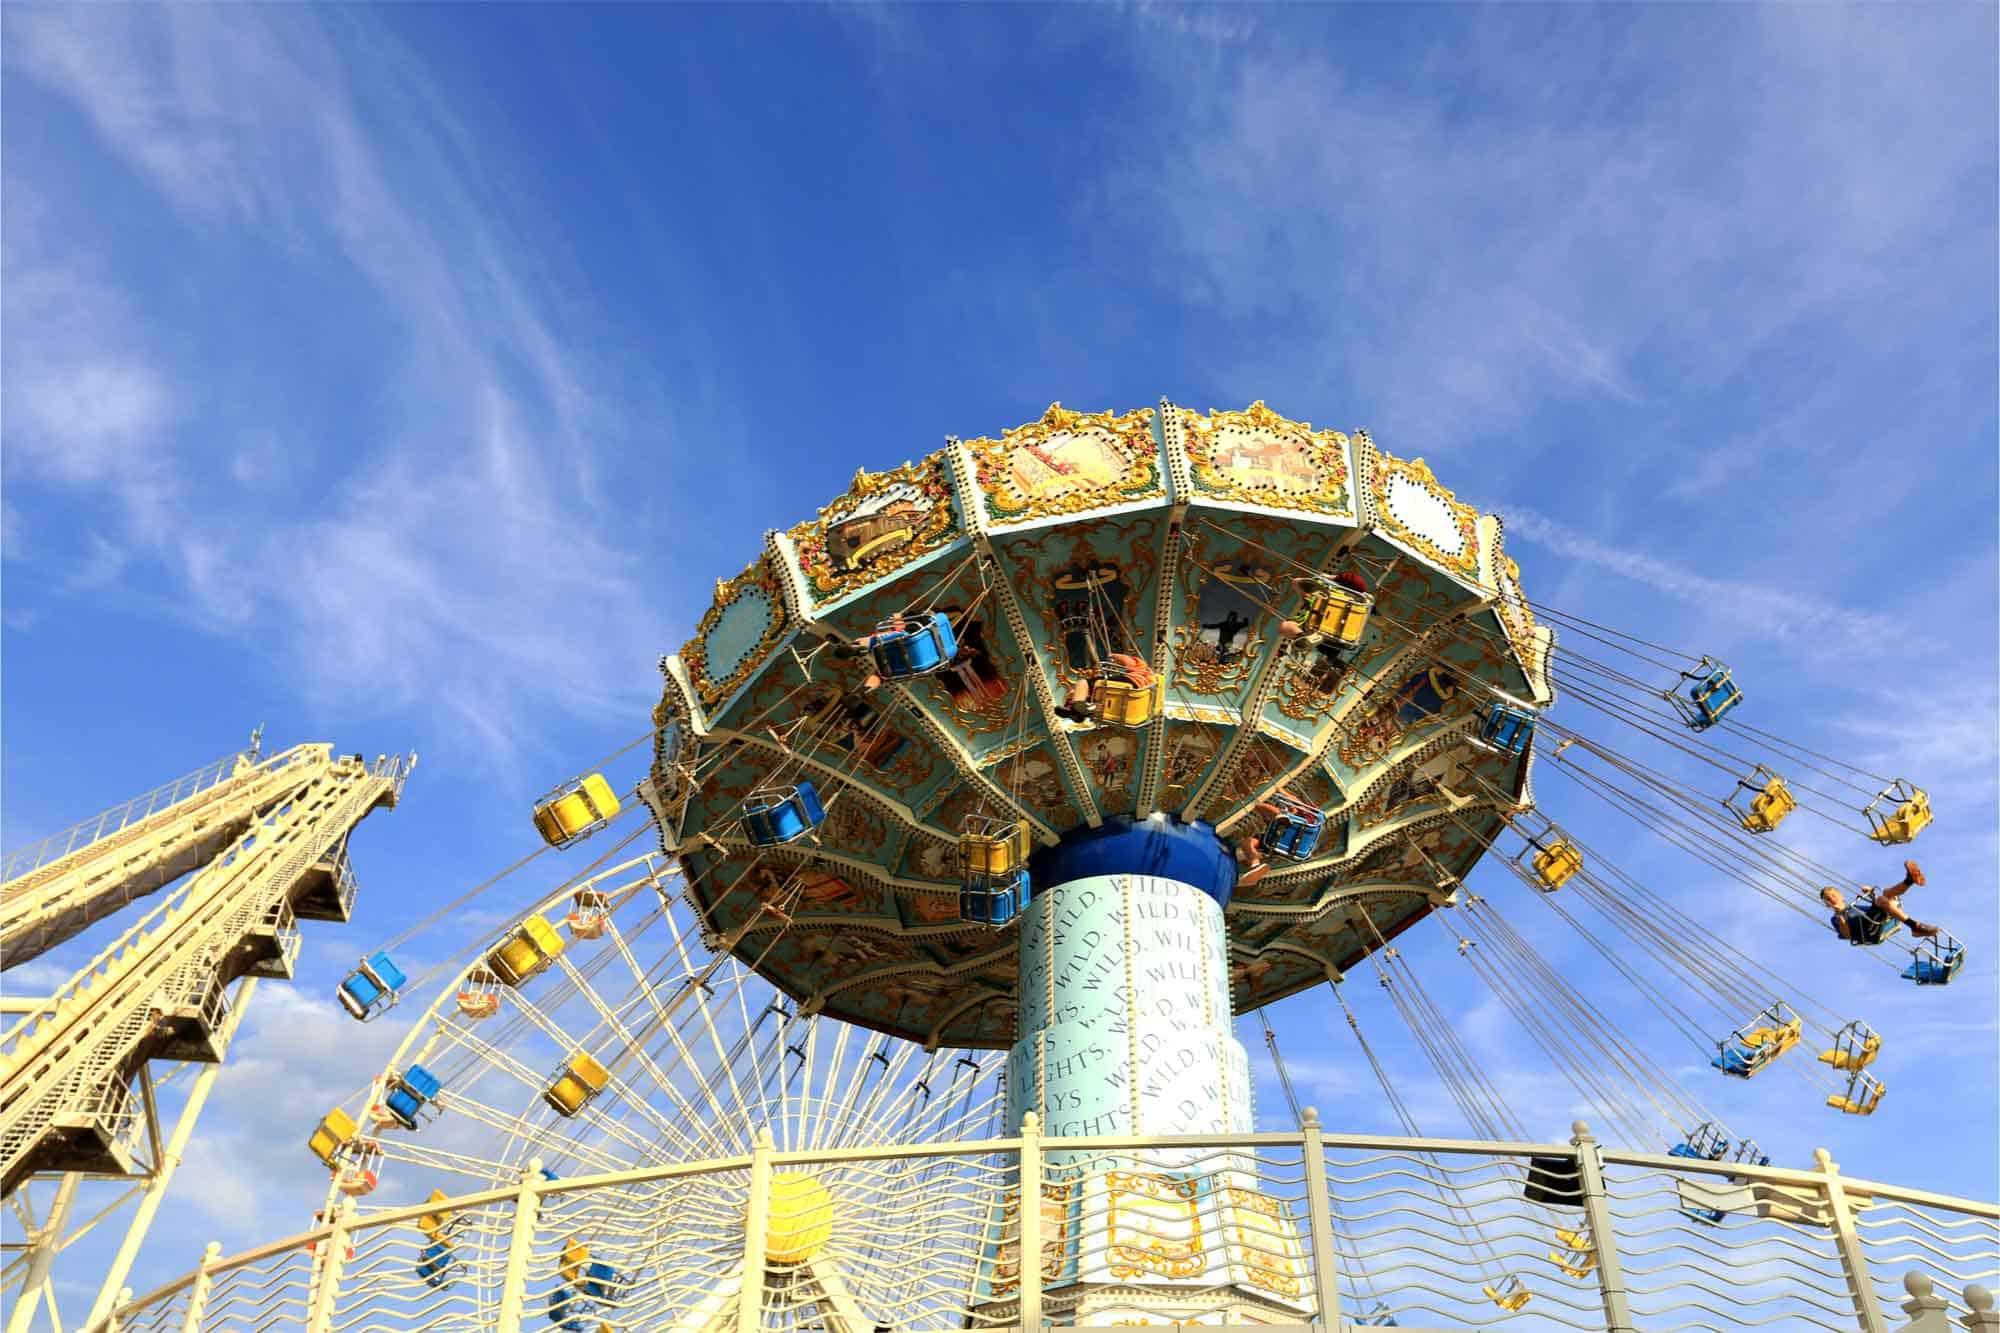 Rotating swing ride at an amusement park